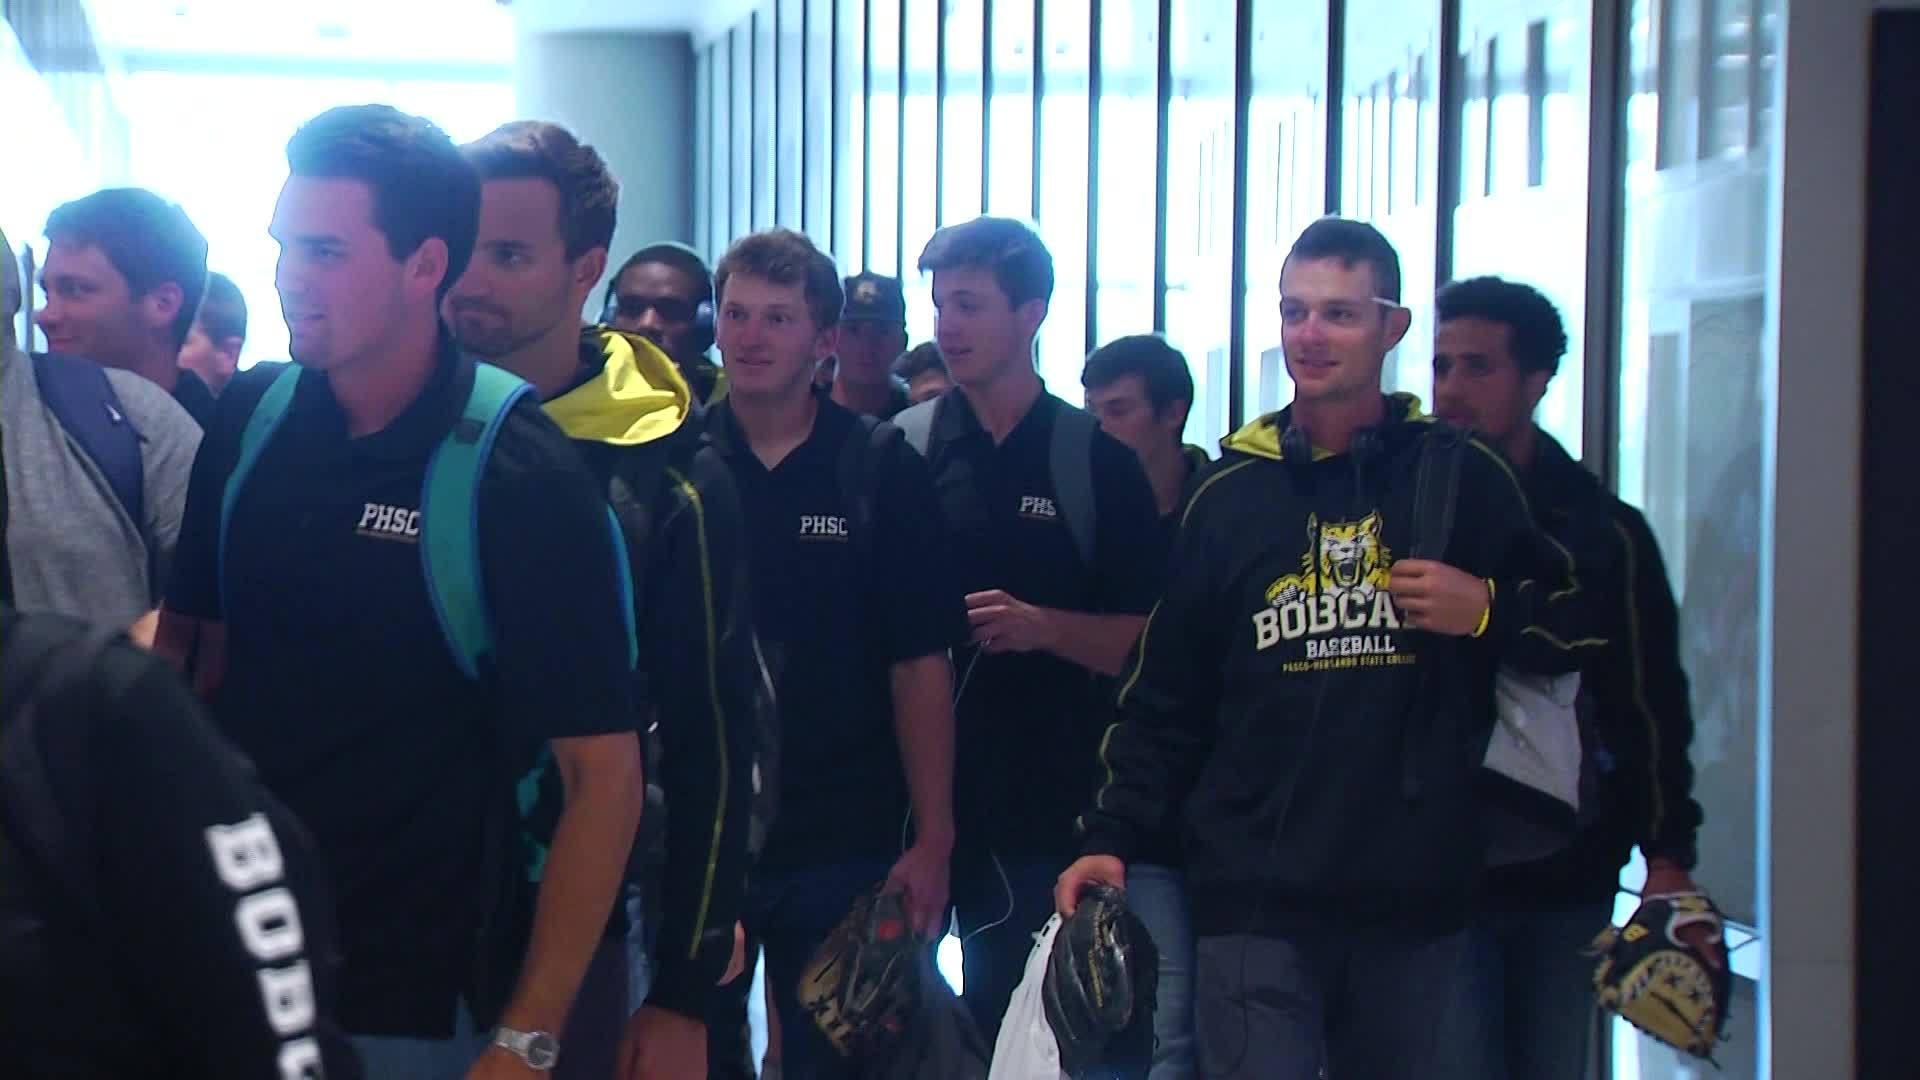 PHSC baseball team advances to DII College World Series